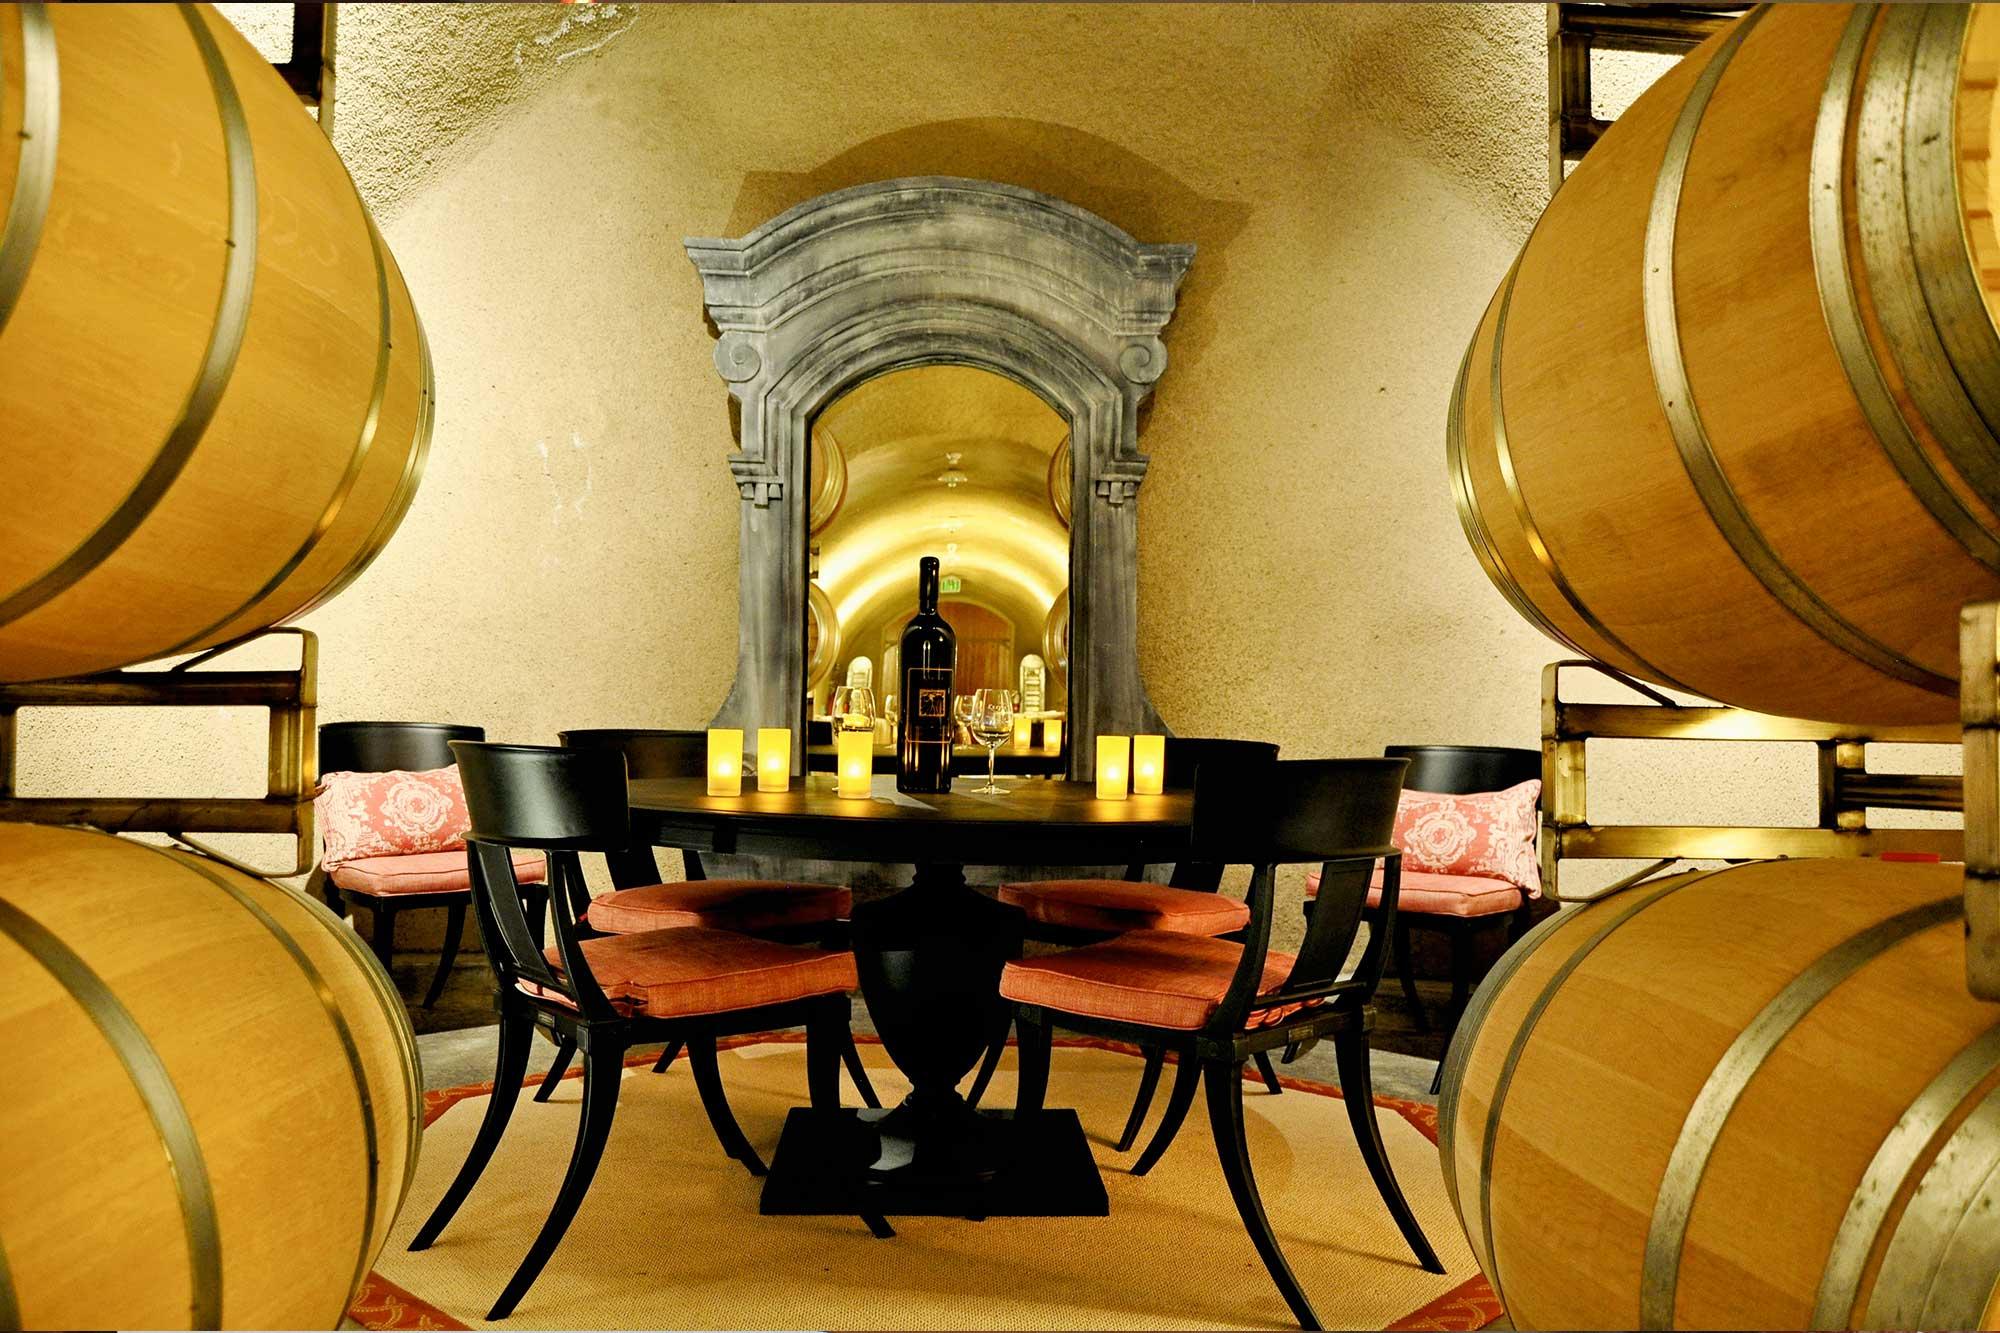 Tasting Room at Keever Vineyards in Yountville, California